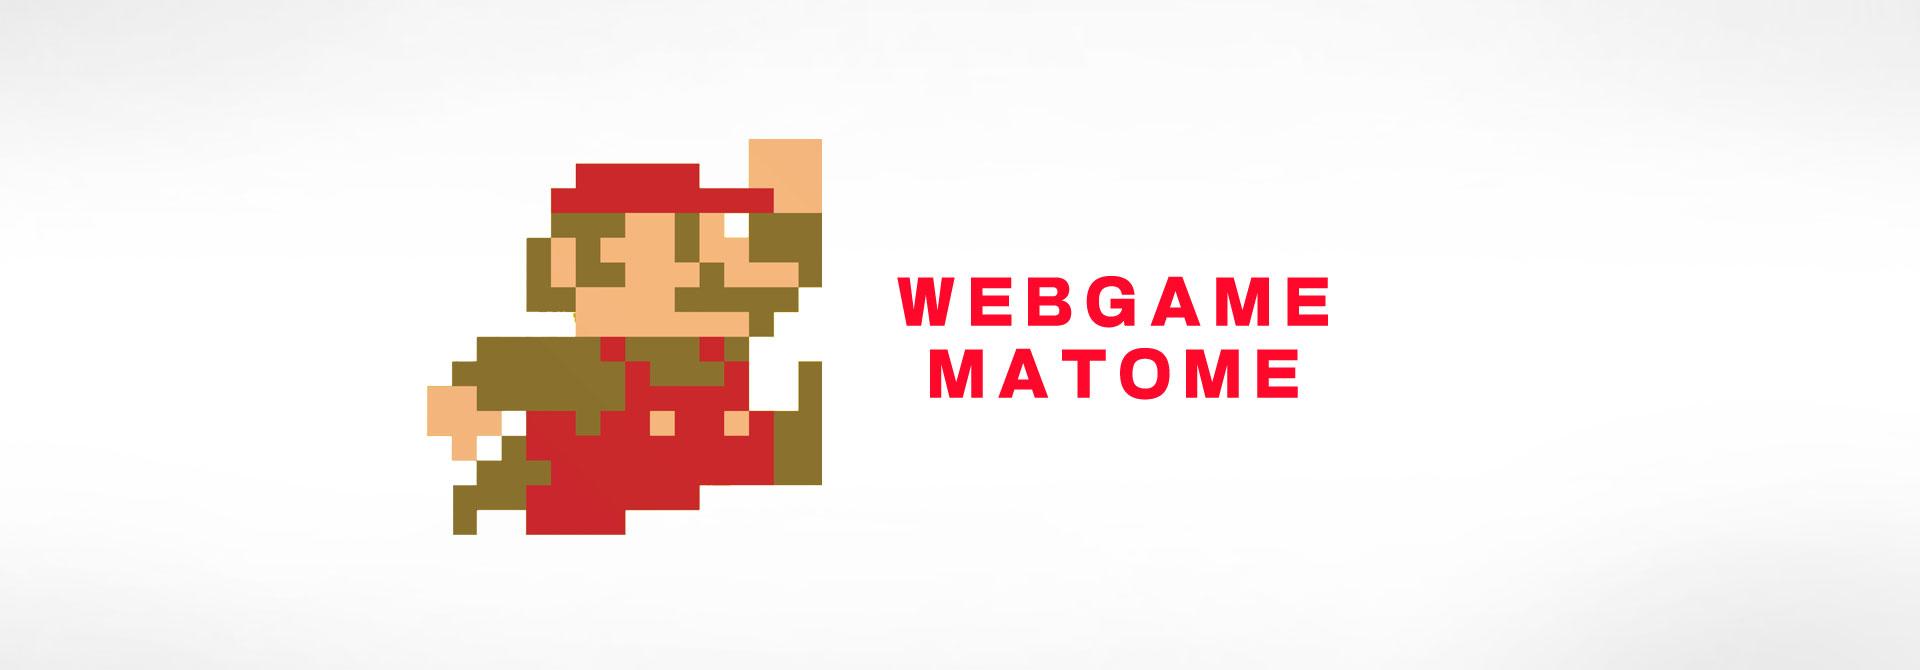 WEBGAMEまとめ